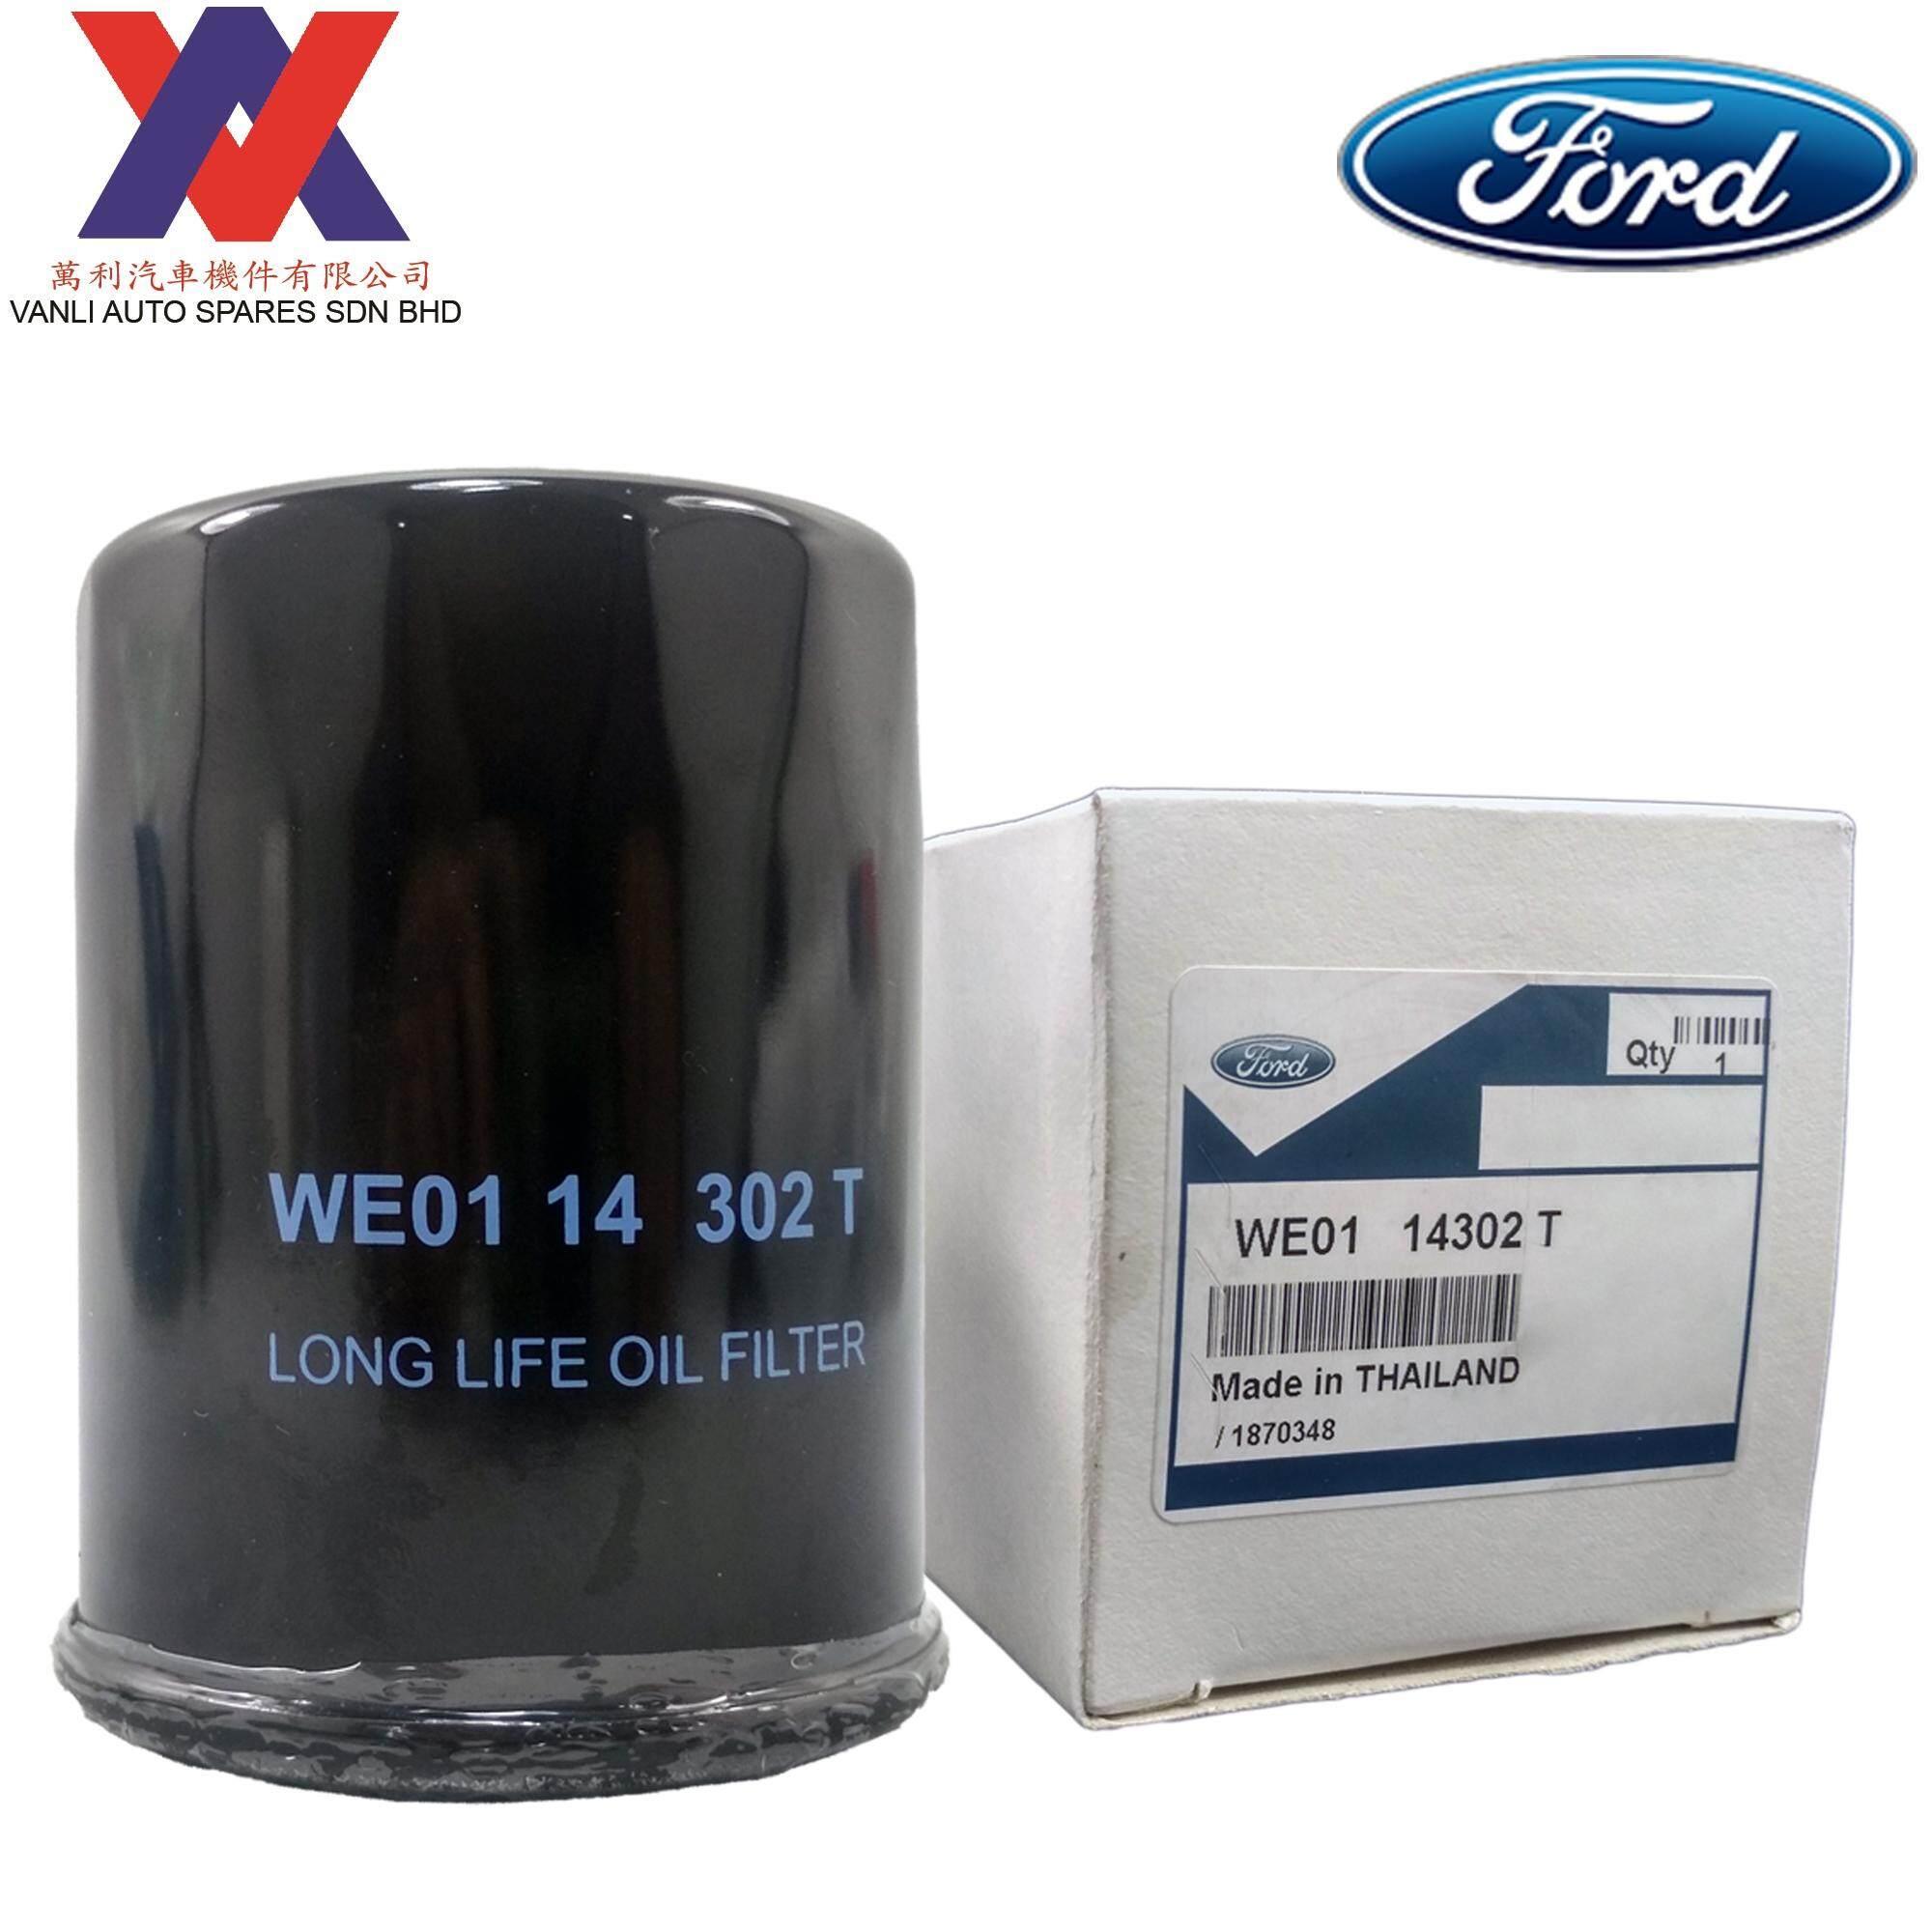 Ford Oil Filter ( WE01-14-302T ) for Ford Ranger WE 2 5 / 3 0cc 2007 - 2011